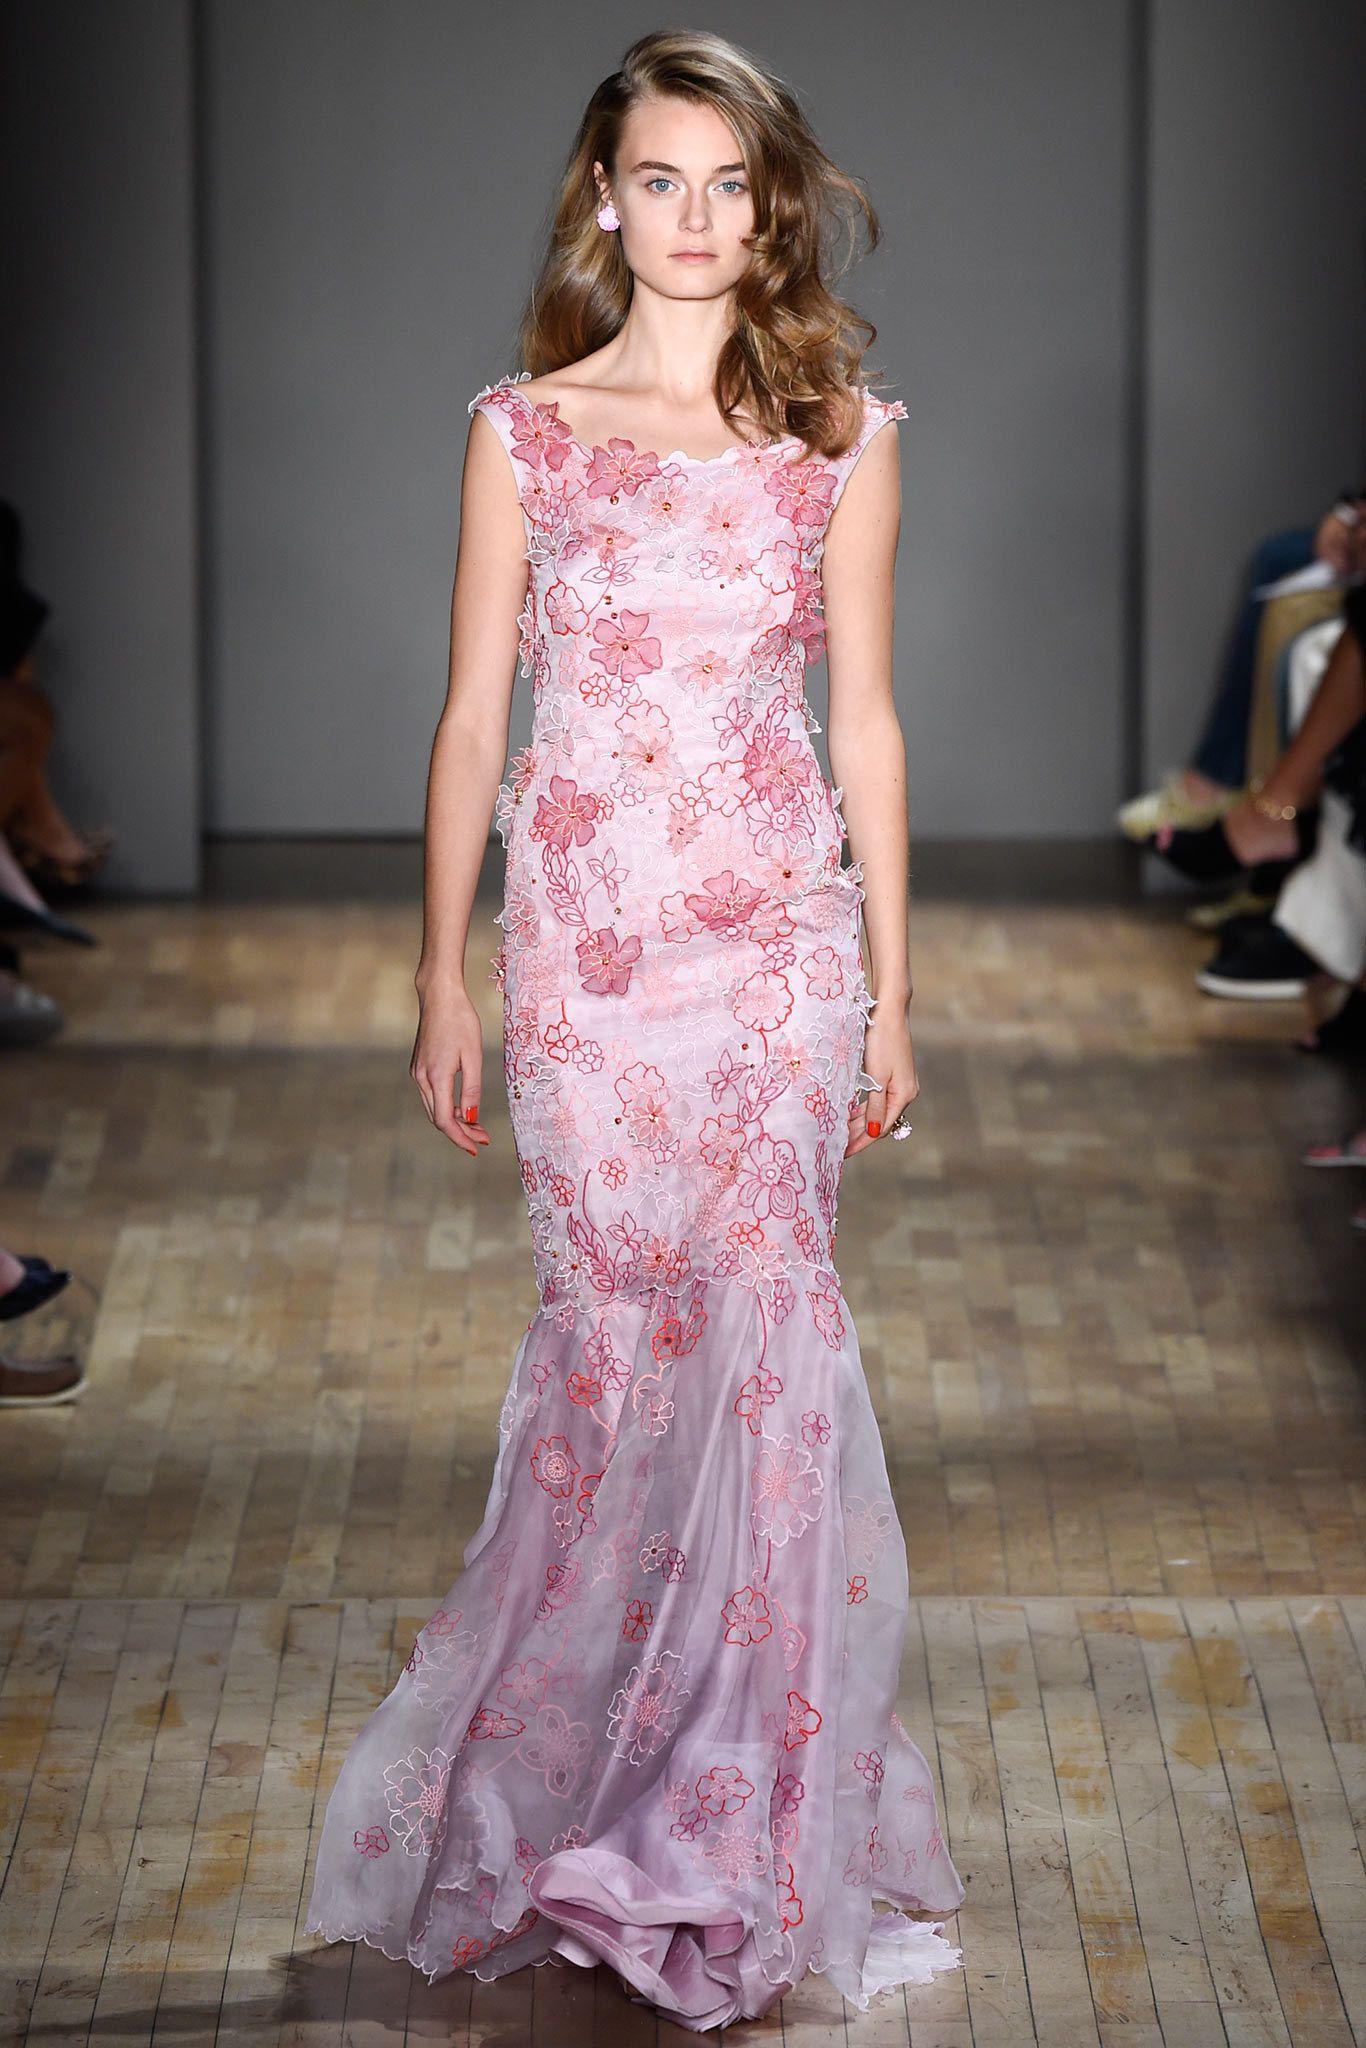 Jenny Packham Spring 2015 Ready-to-Wear Fashion Show | vestidos ...